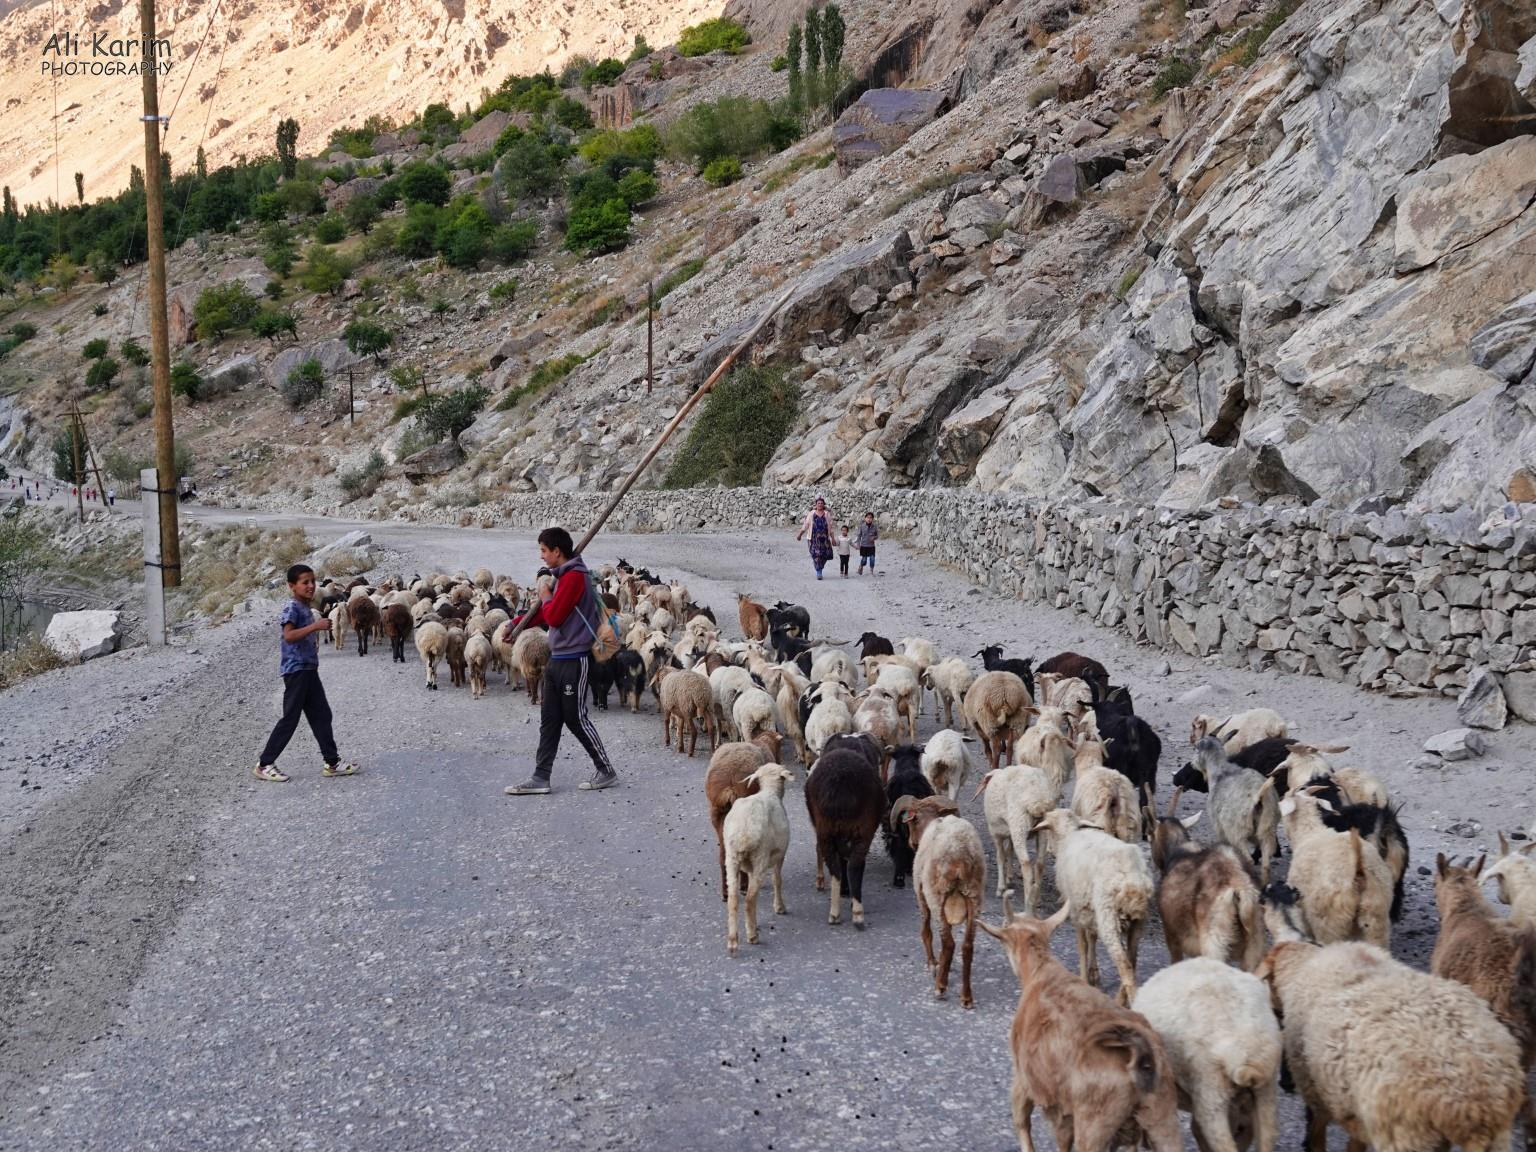 Dushanbe, Tajikistan Traffic Jams along M41 Pamir Highway